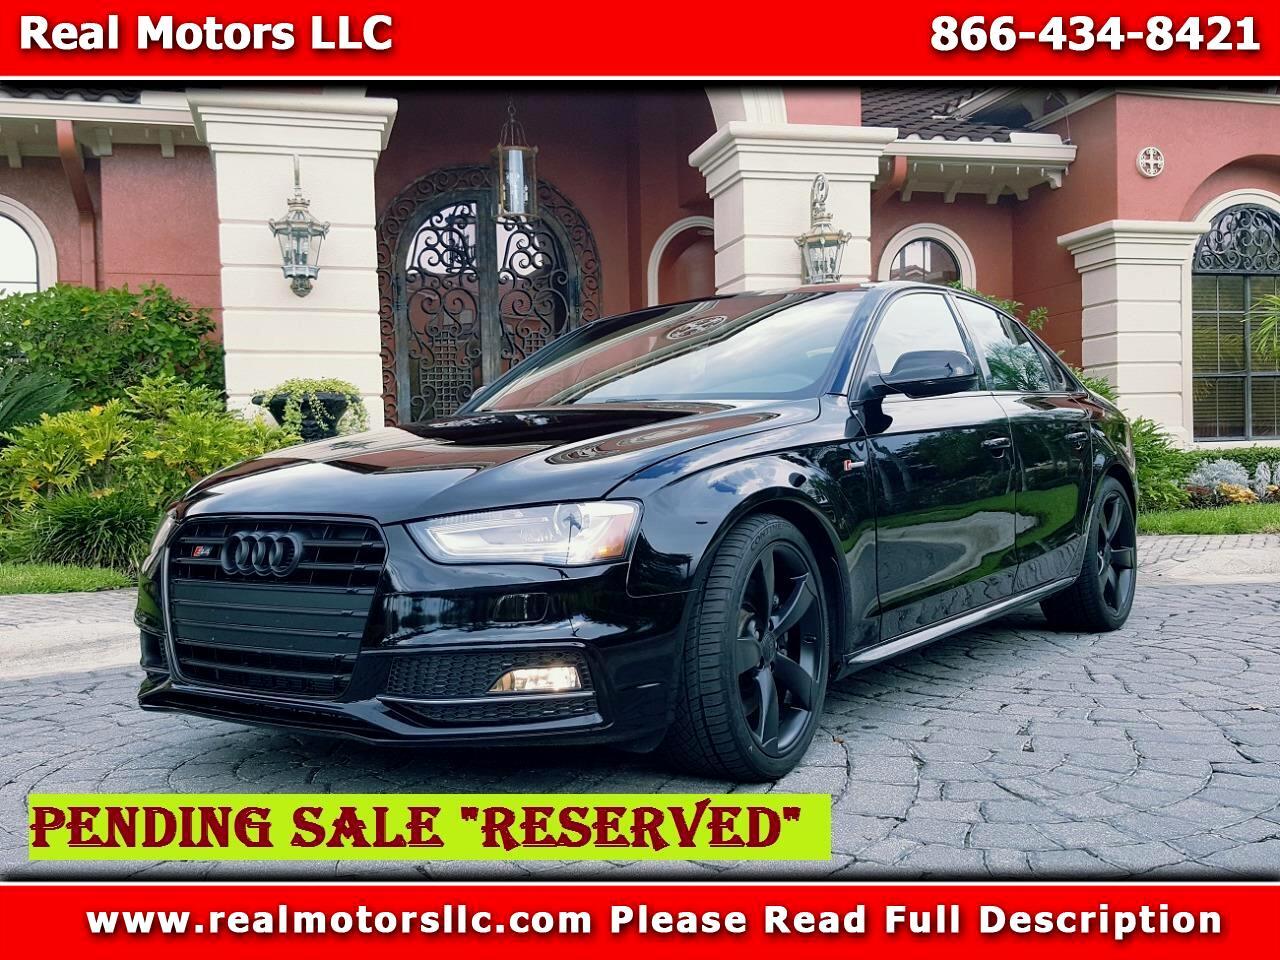 2016 Audi S4 Prestige, Black Optic Package